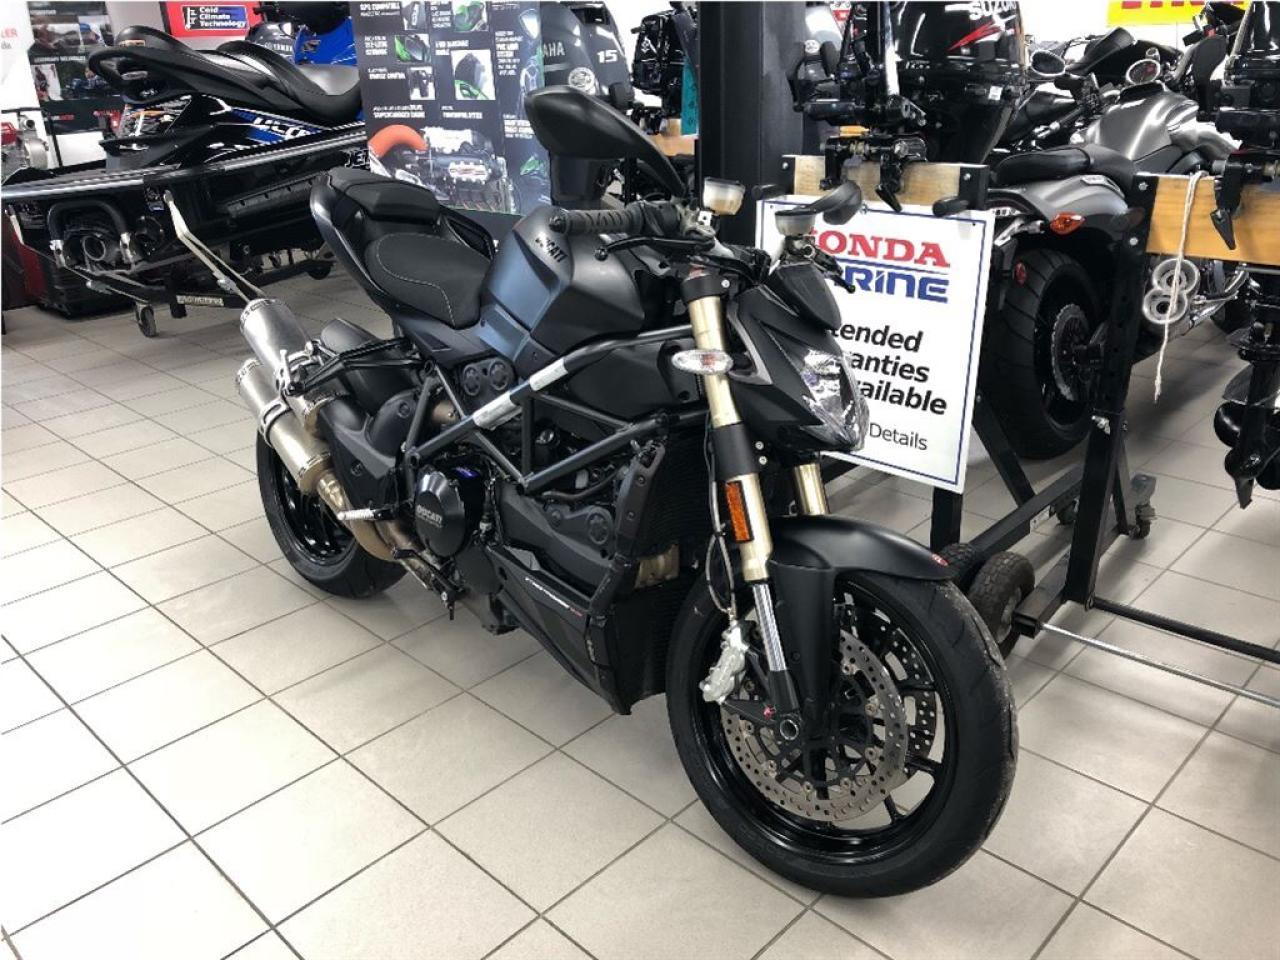 Photo of Black 2013 Ducati Streetfighter 848